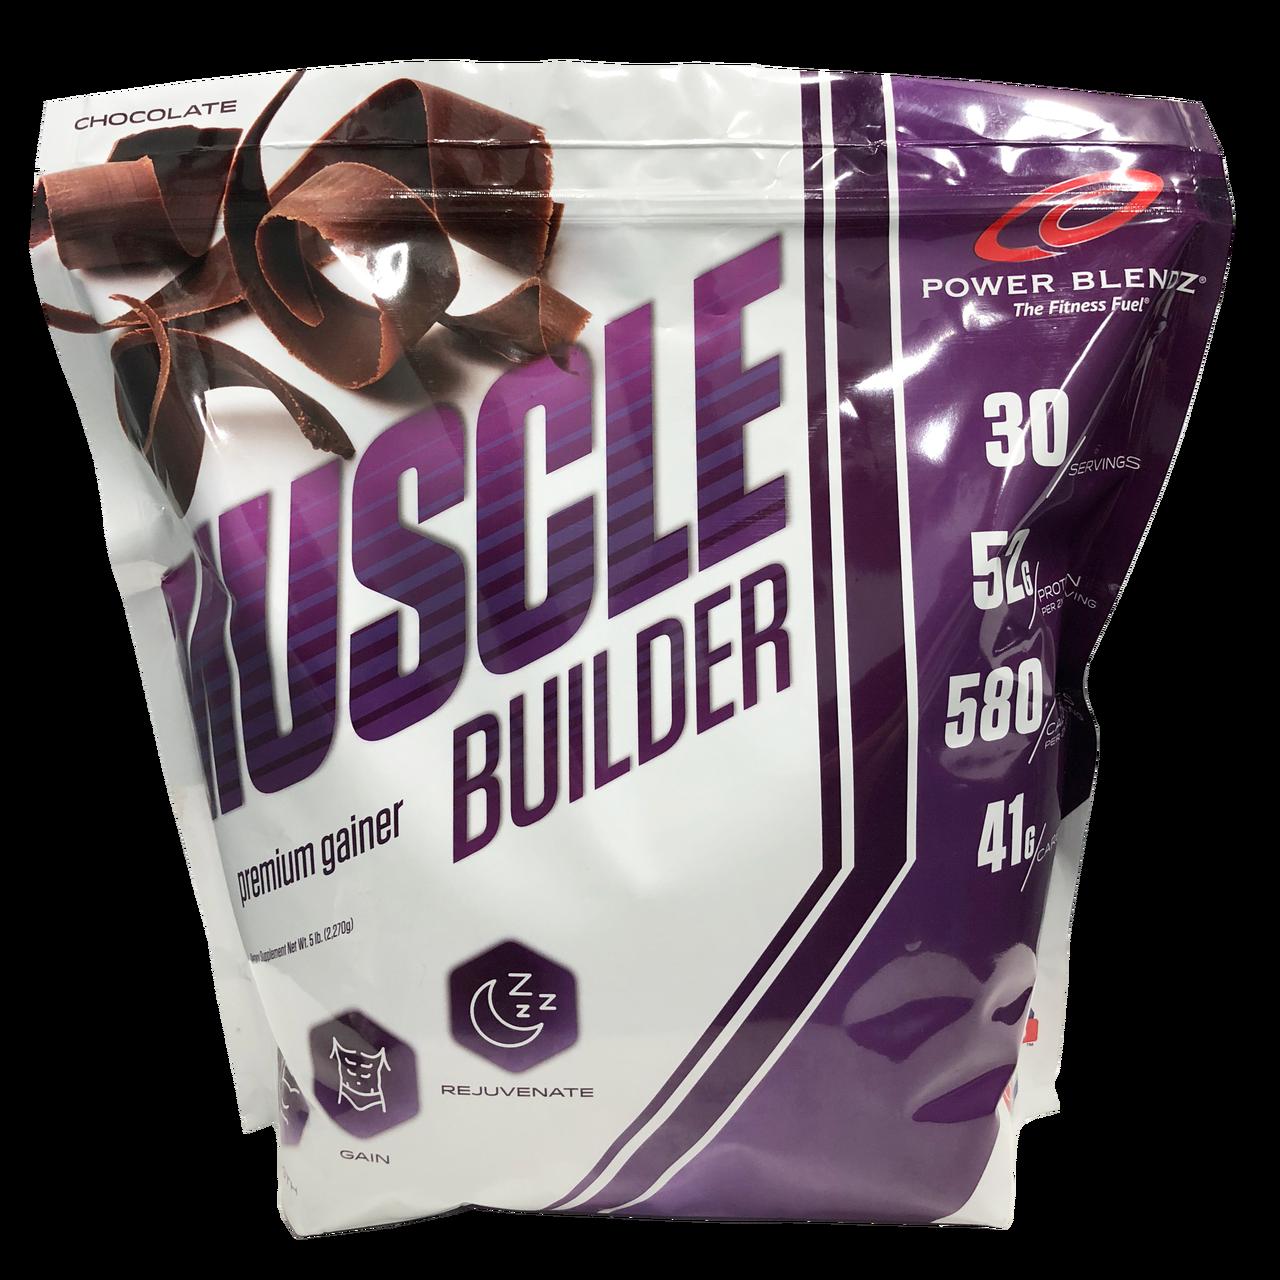 Muscle Builder 5lb Power Blendz - The Fitness Fuel